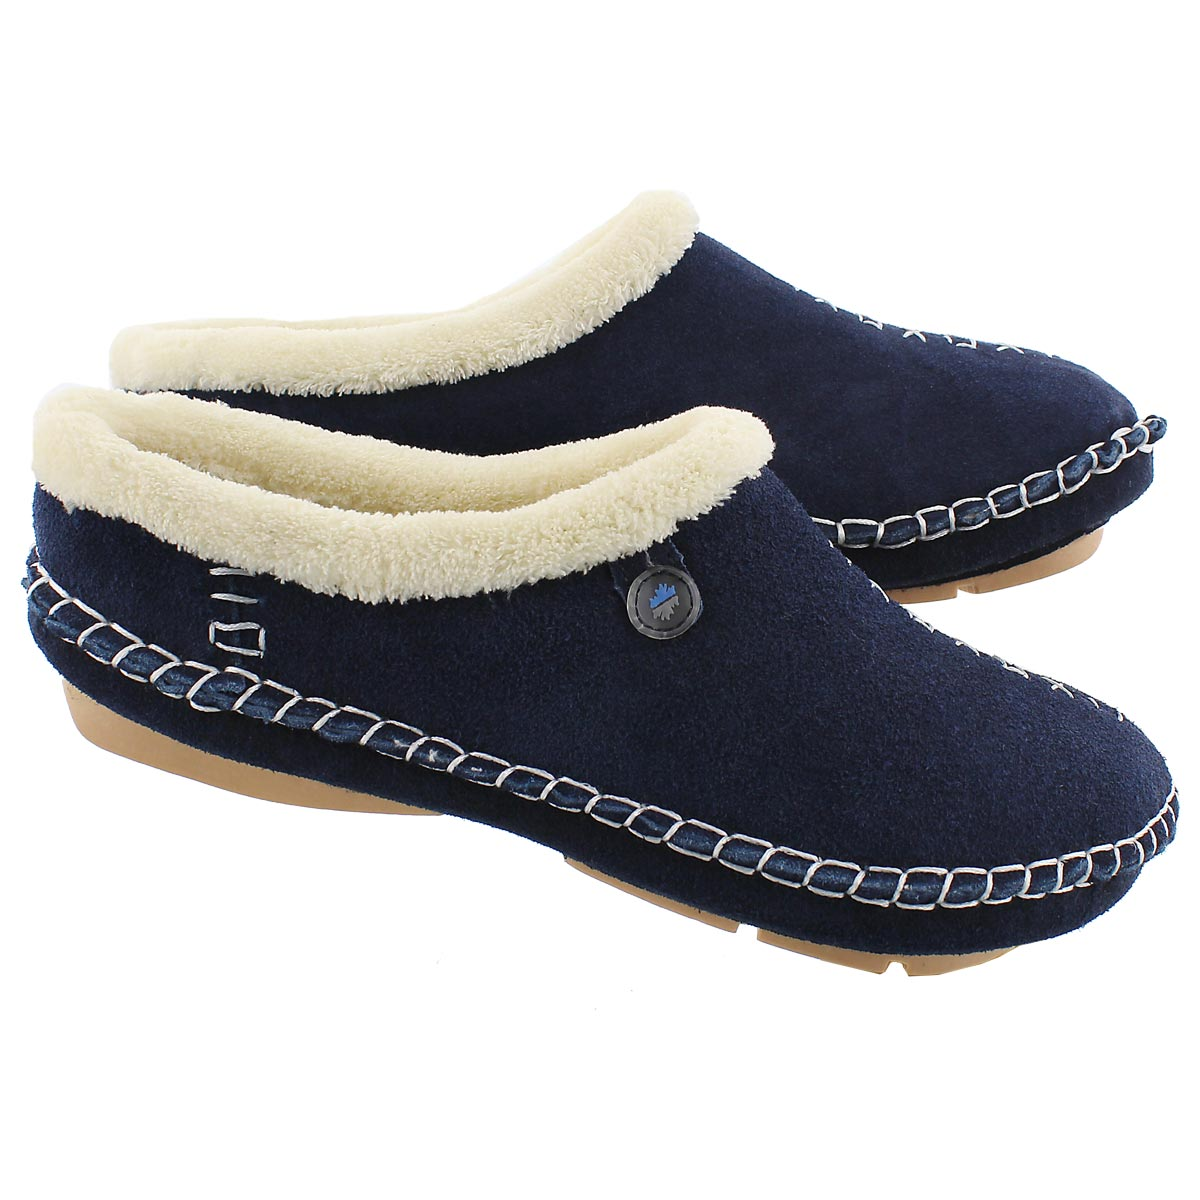 Pantoufles Rosa, bleu marine, femmes